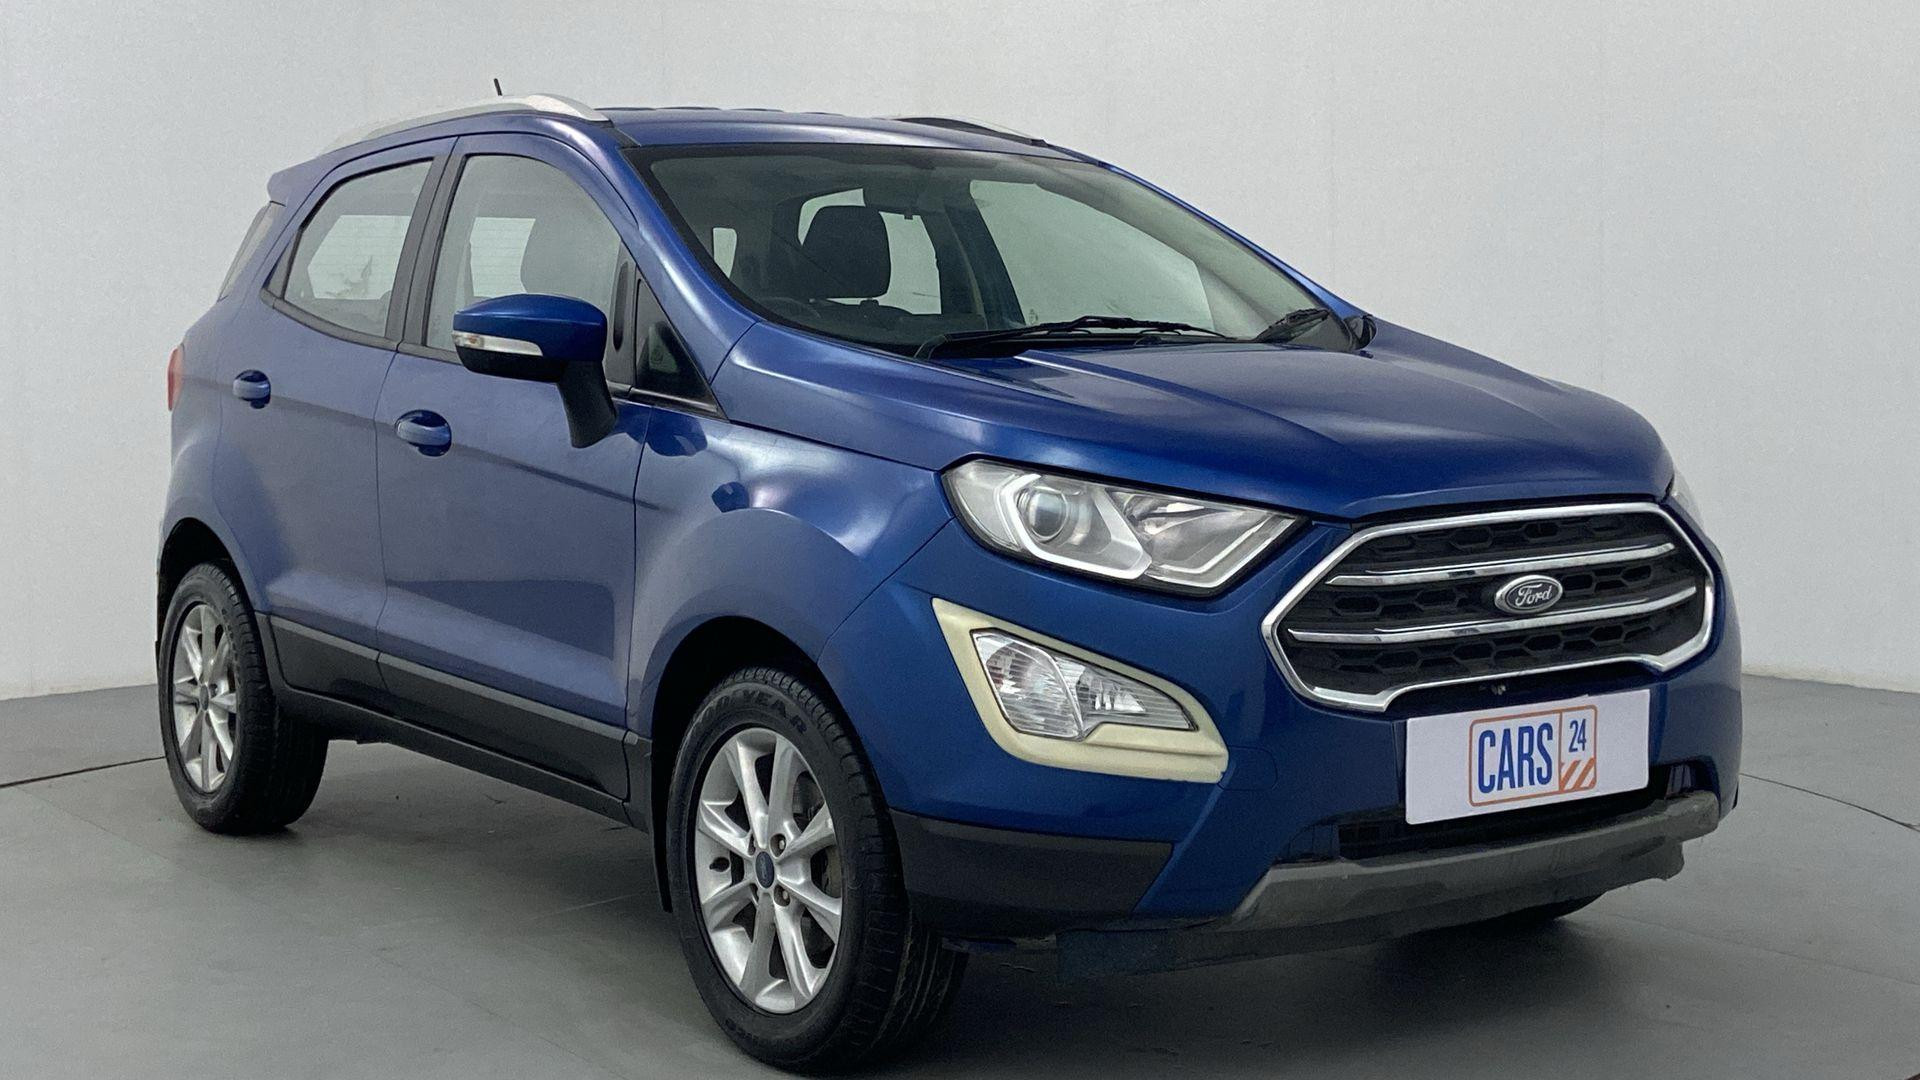 2018 Ford Ecosport 1.5 TREND+ TDCI